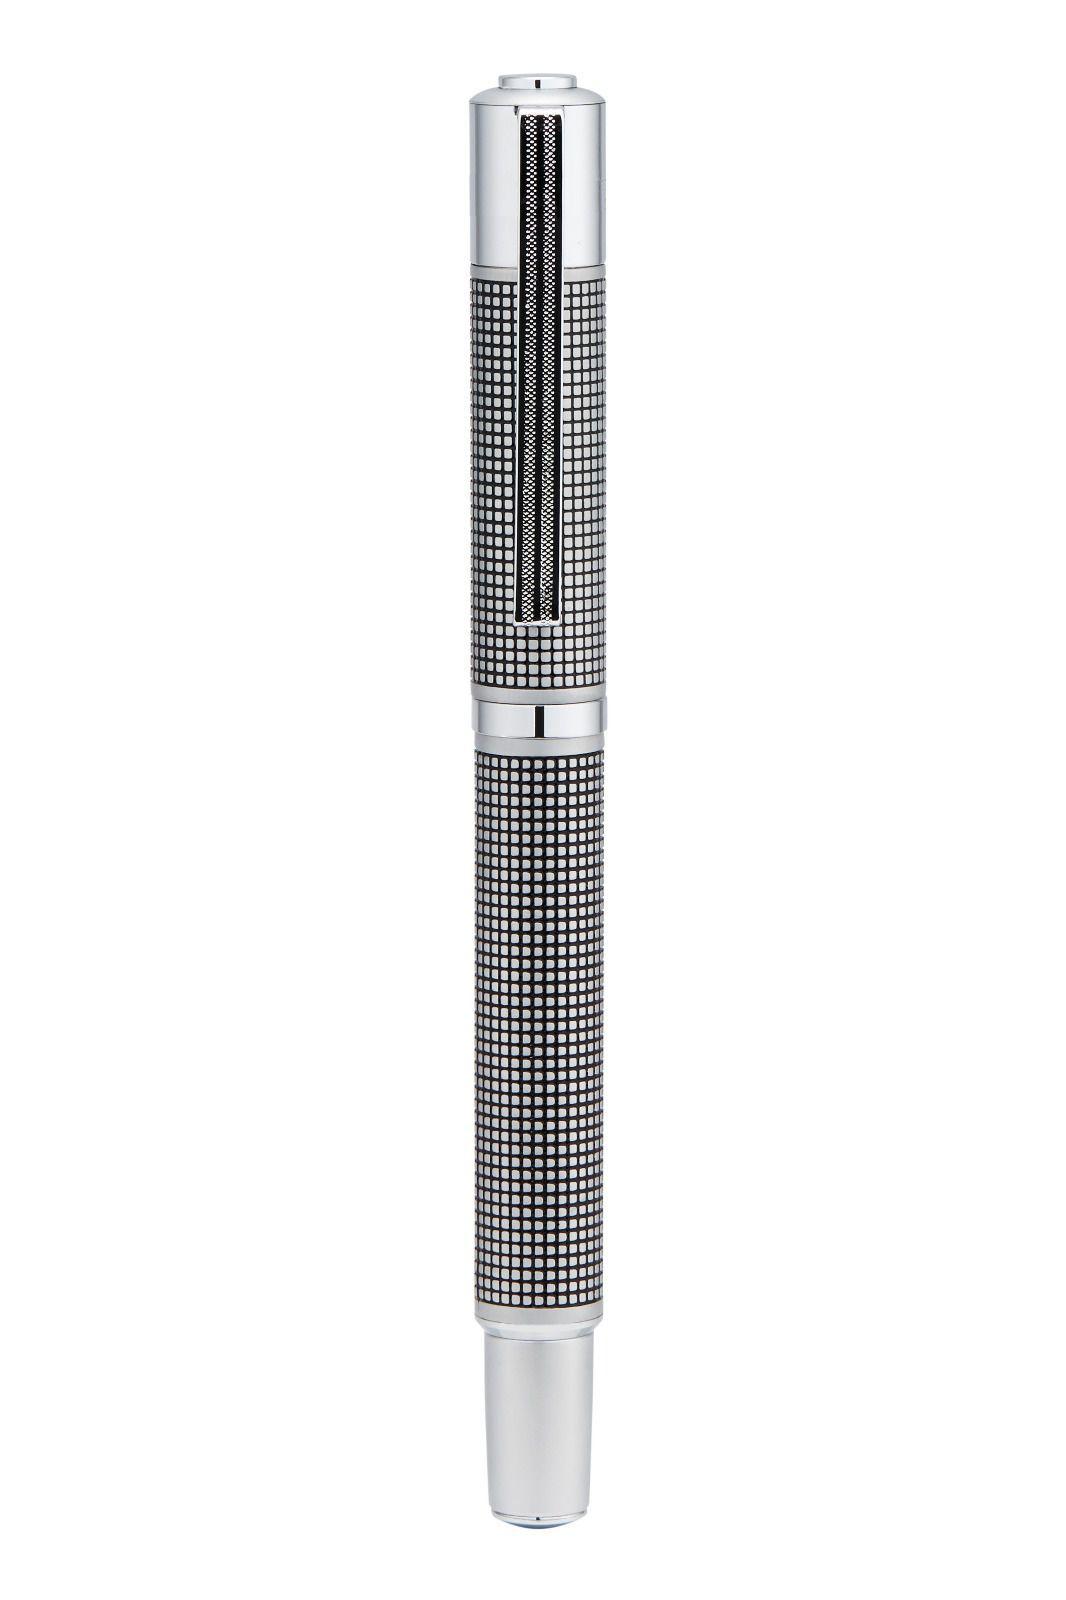 Yookers Fiberpen Metis cromada quadriculada C/ Conversor De Tinta.